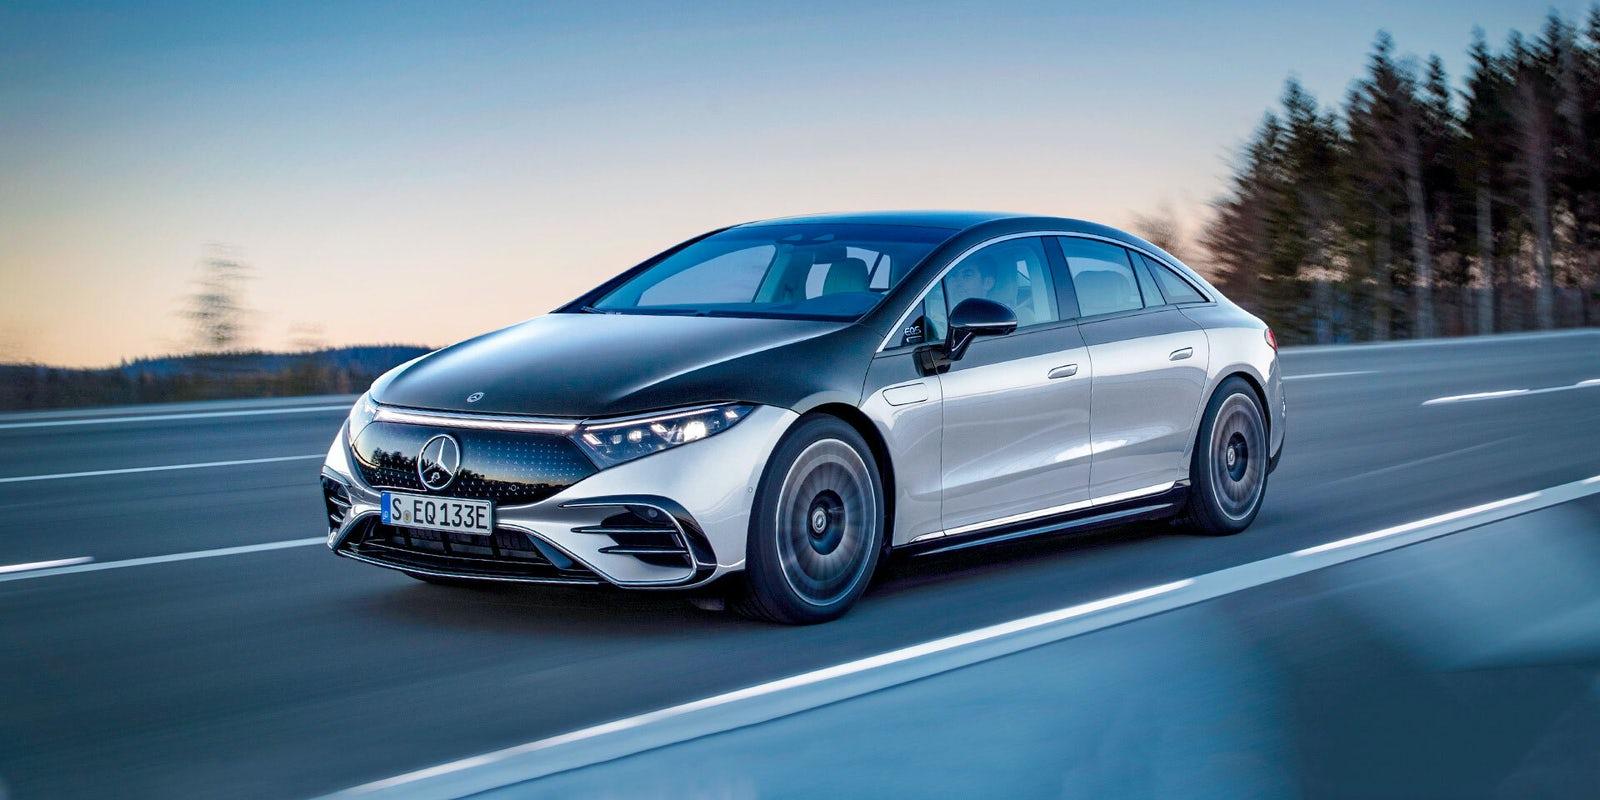 https://revijahak.hr/wp-content/uploads/2021/07/mercedes-eqs-revealed-front-driving-1-lead-1.jpg